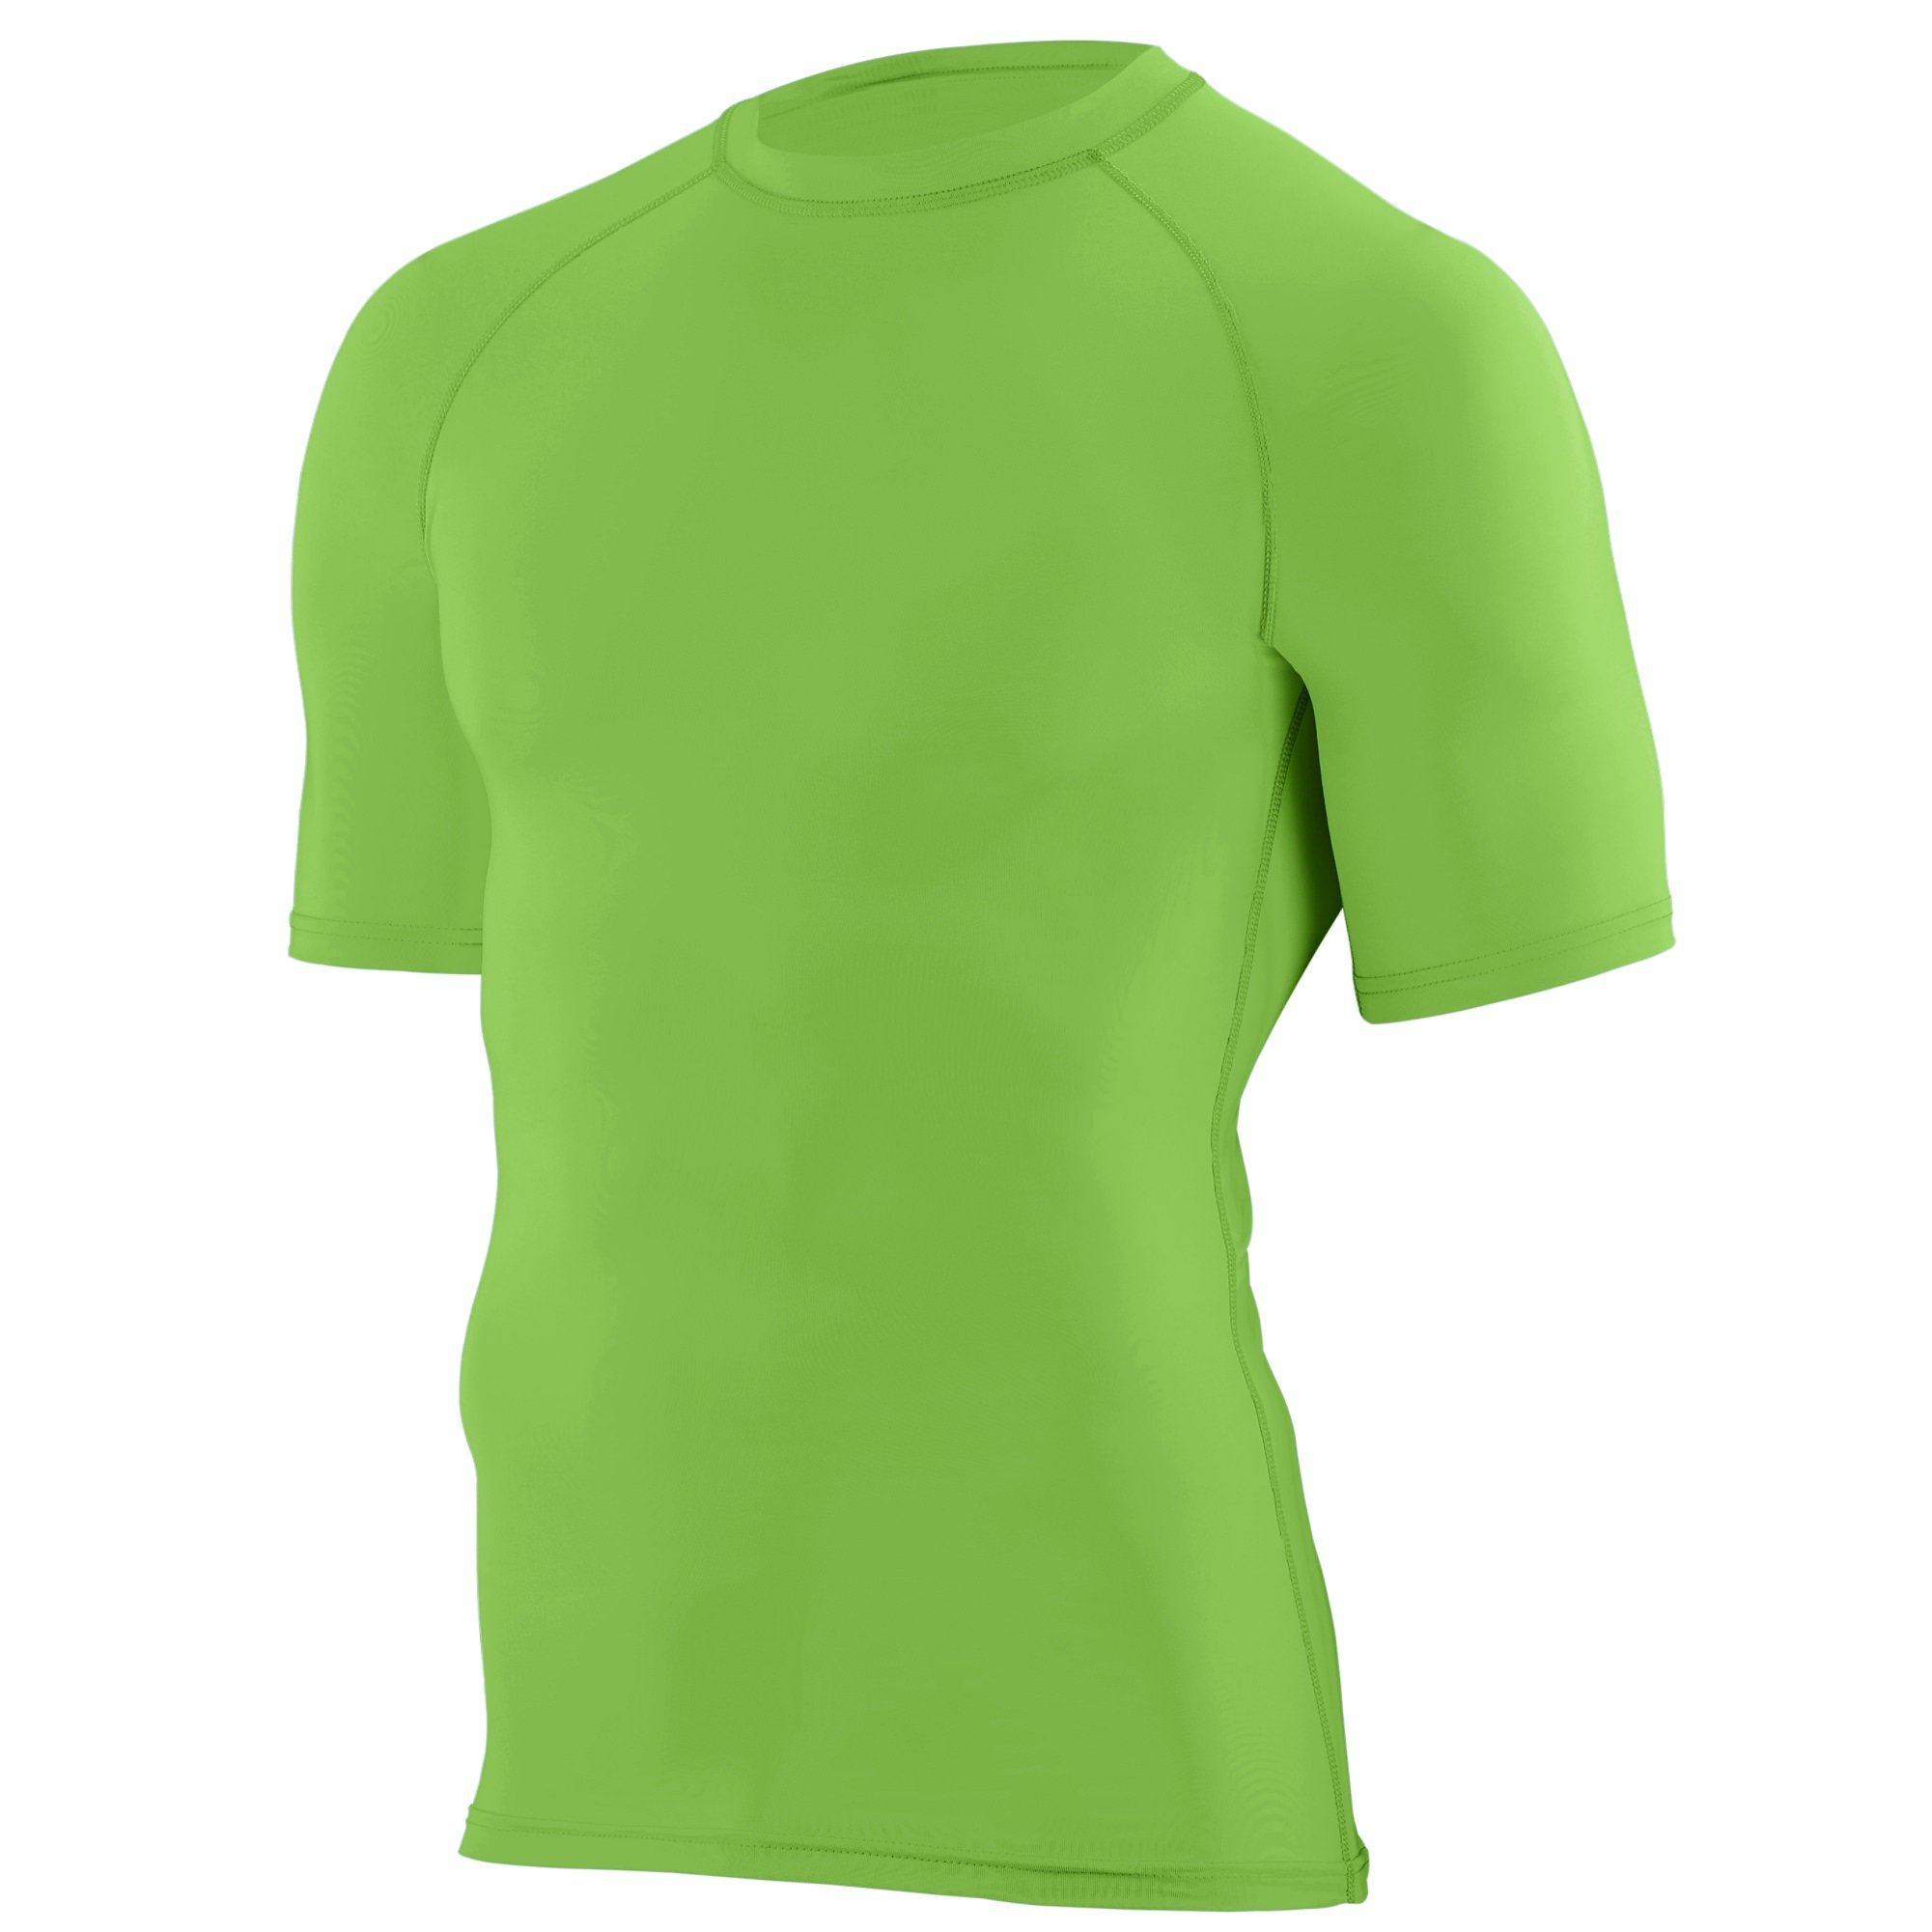 Augusta Sportswear Boys' Hyperform Compression Short Sleeve Shirt S Lime